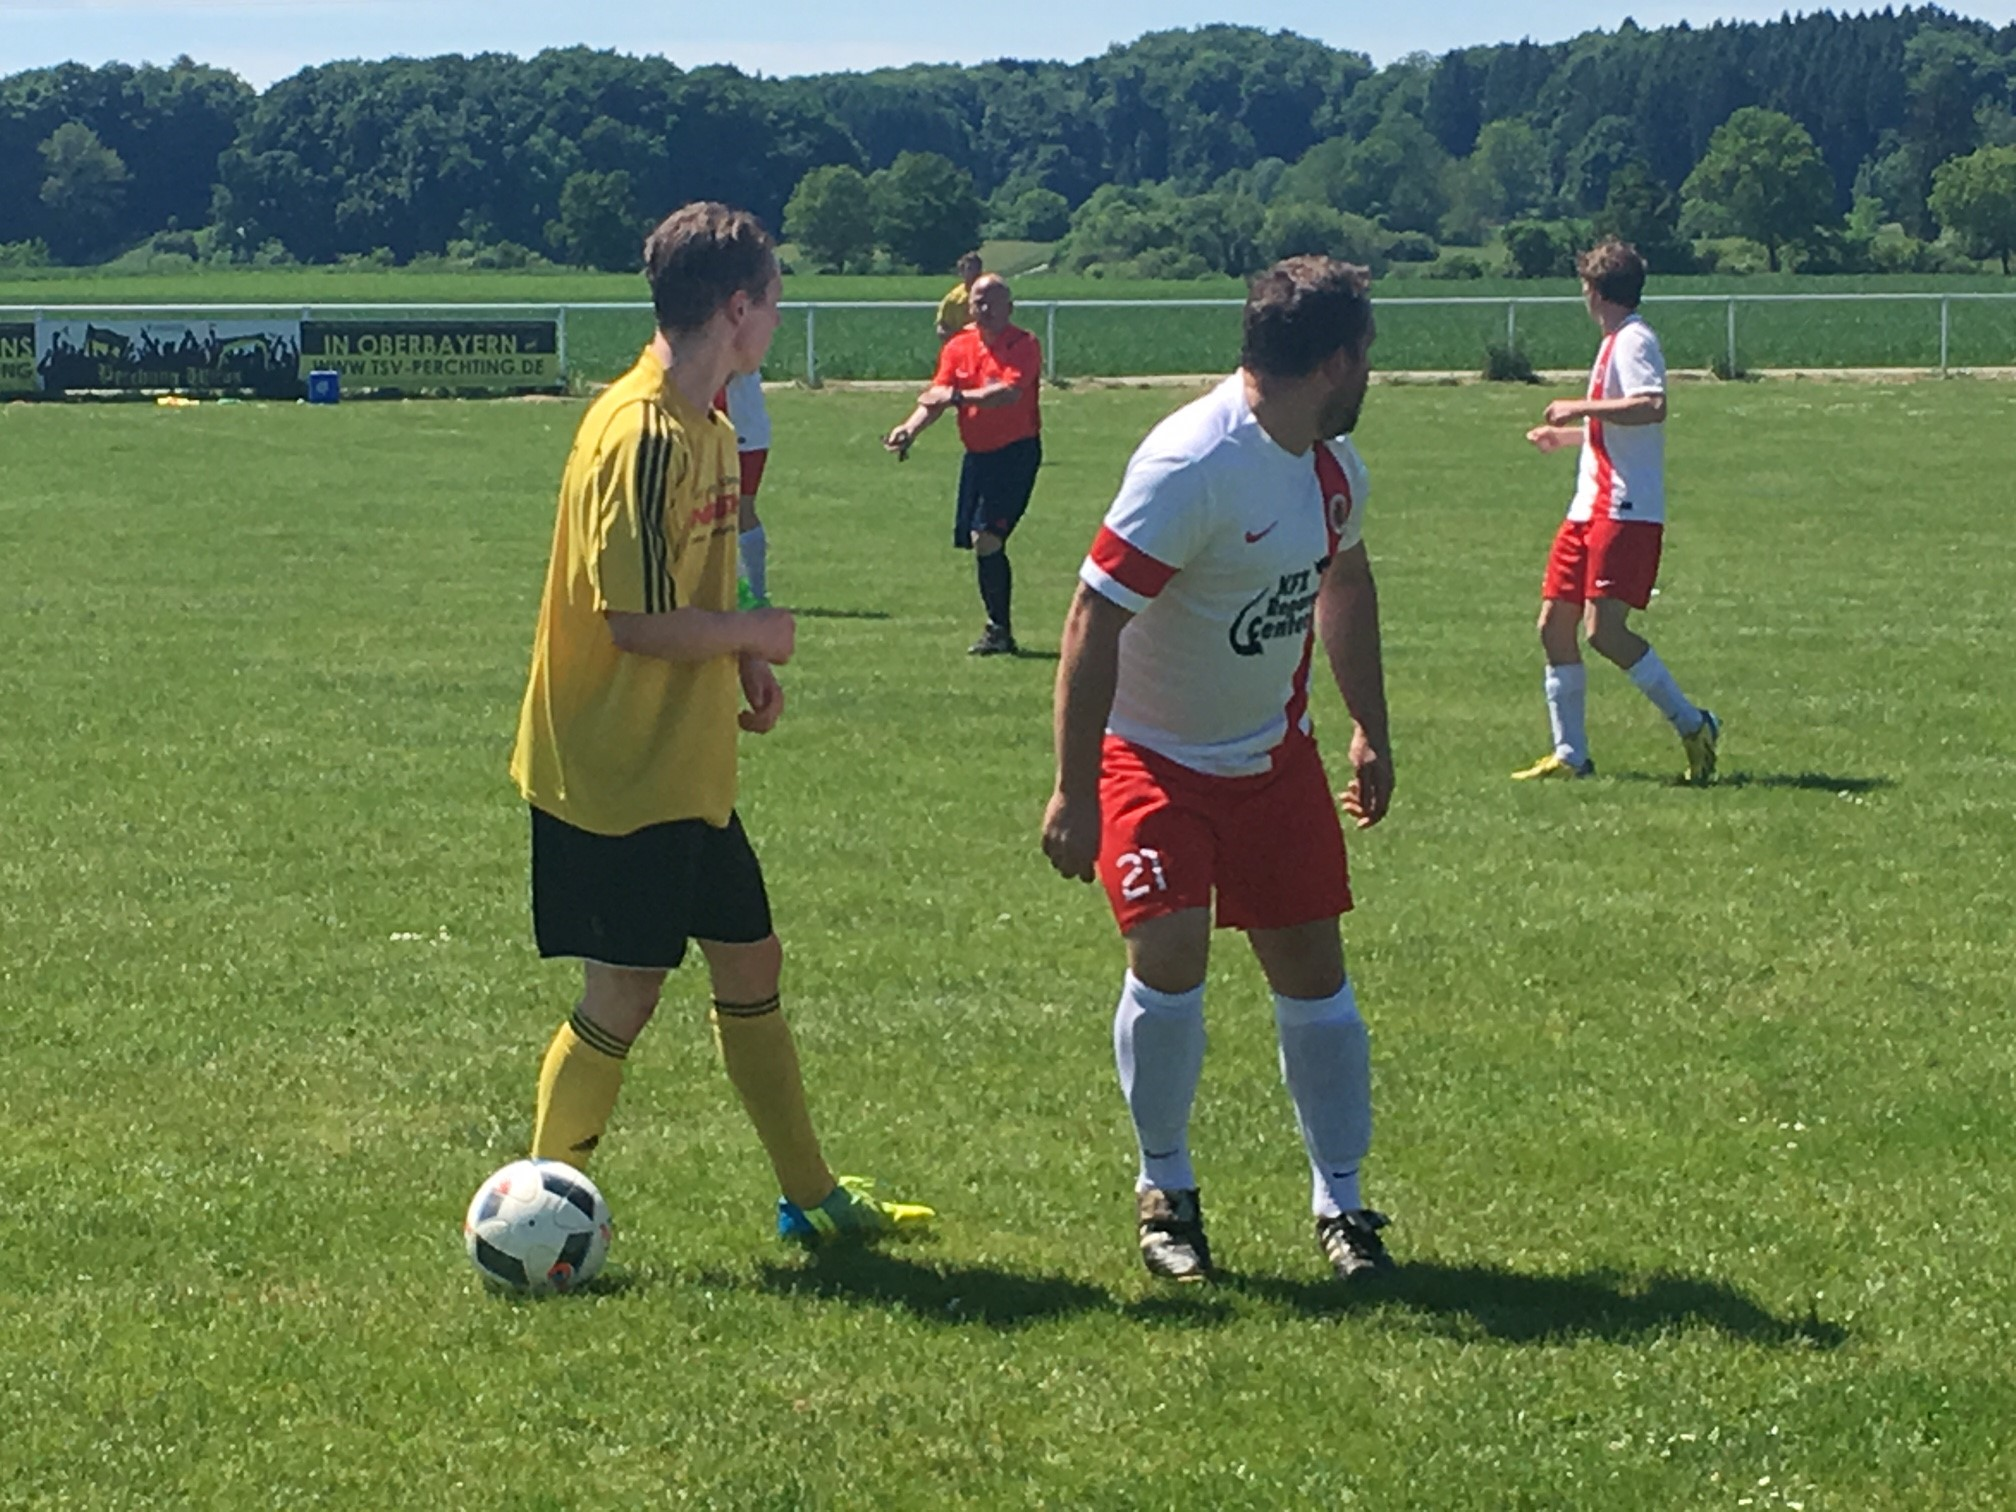 sv-unterhausen.de - SVU Fußballcamp 2017